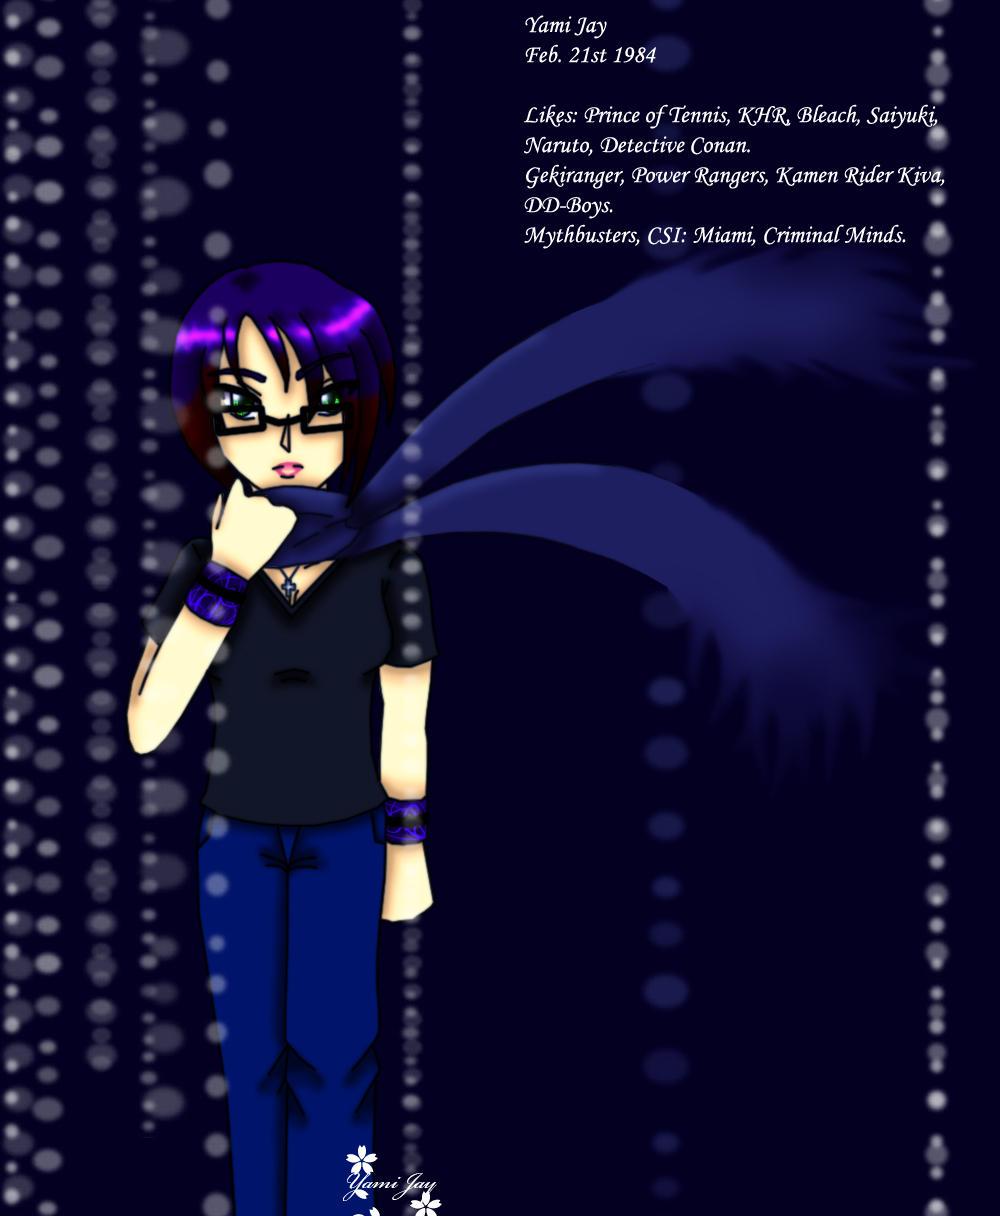 YamiJay's Profile Picture